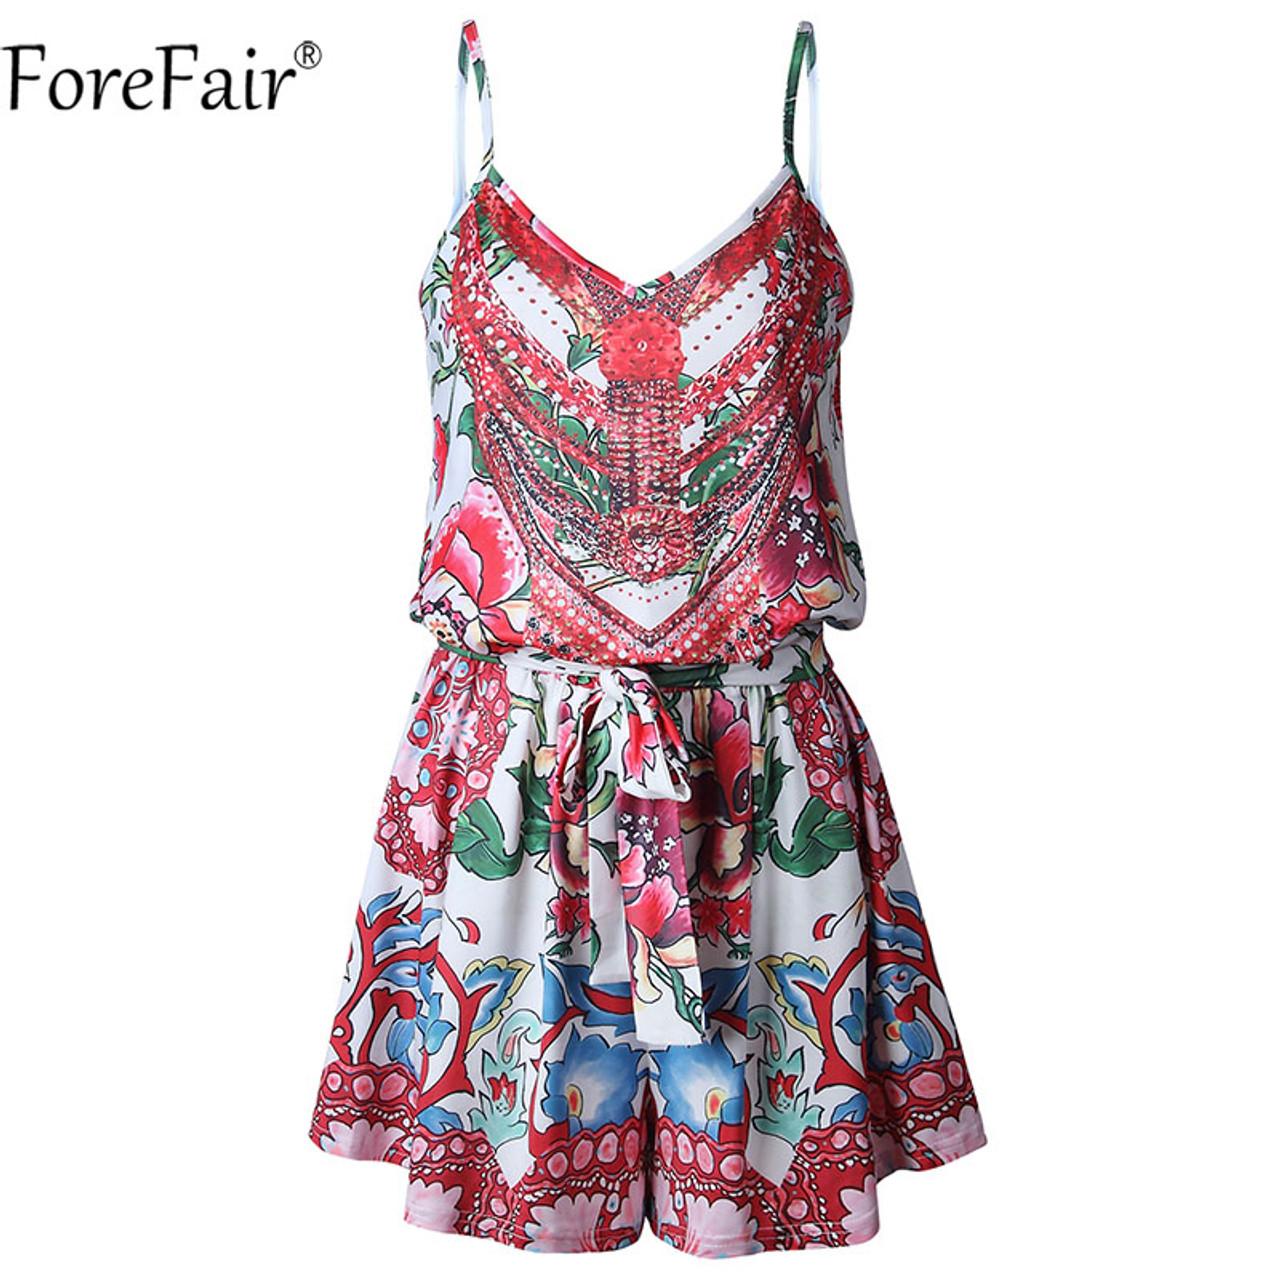 cada4641413f ... ForeFair Backless Strap Floral Print V Neck Vintage Playsuits Casual  Summer Rompers women jumpsuit ...